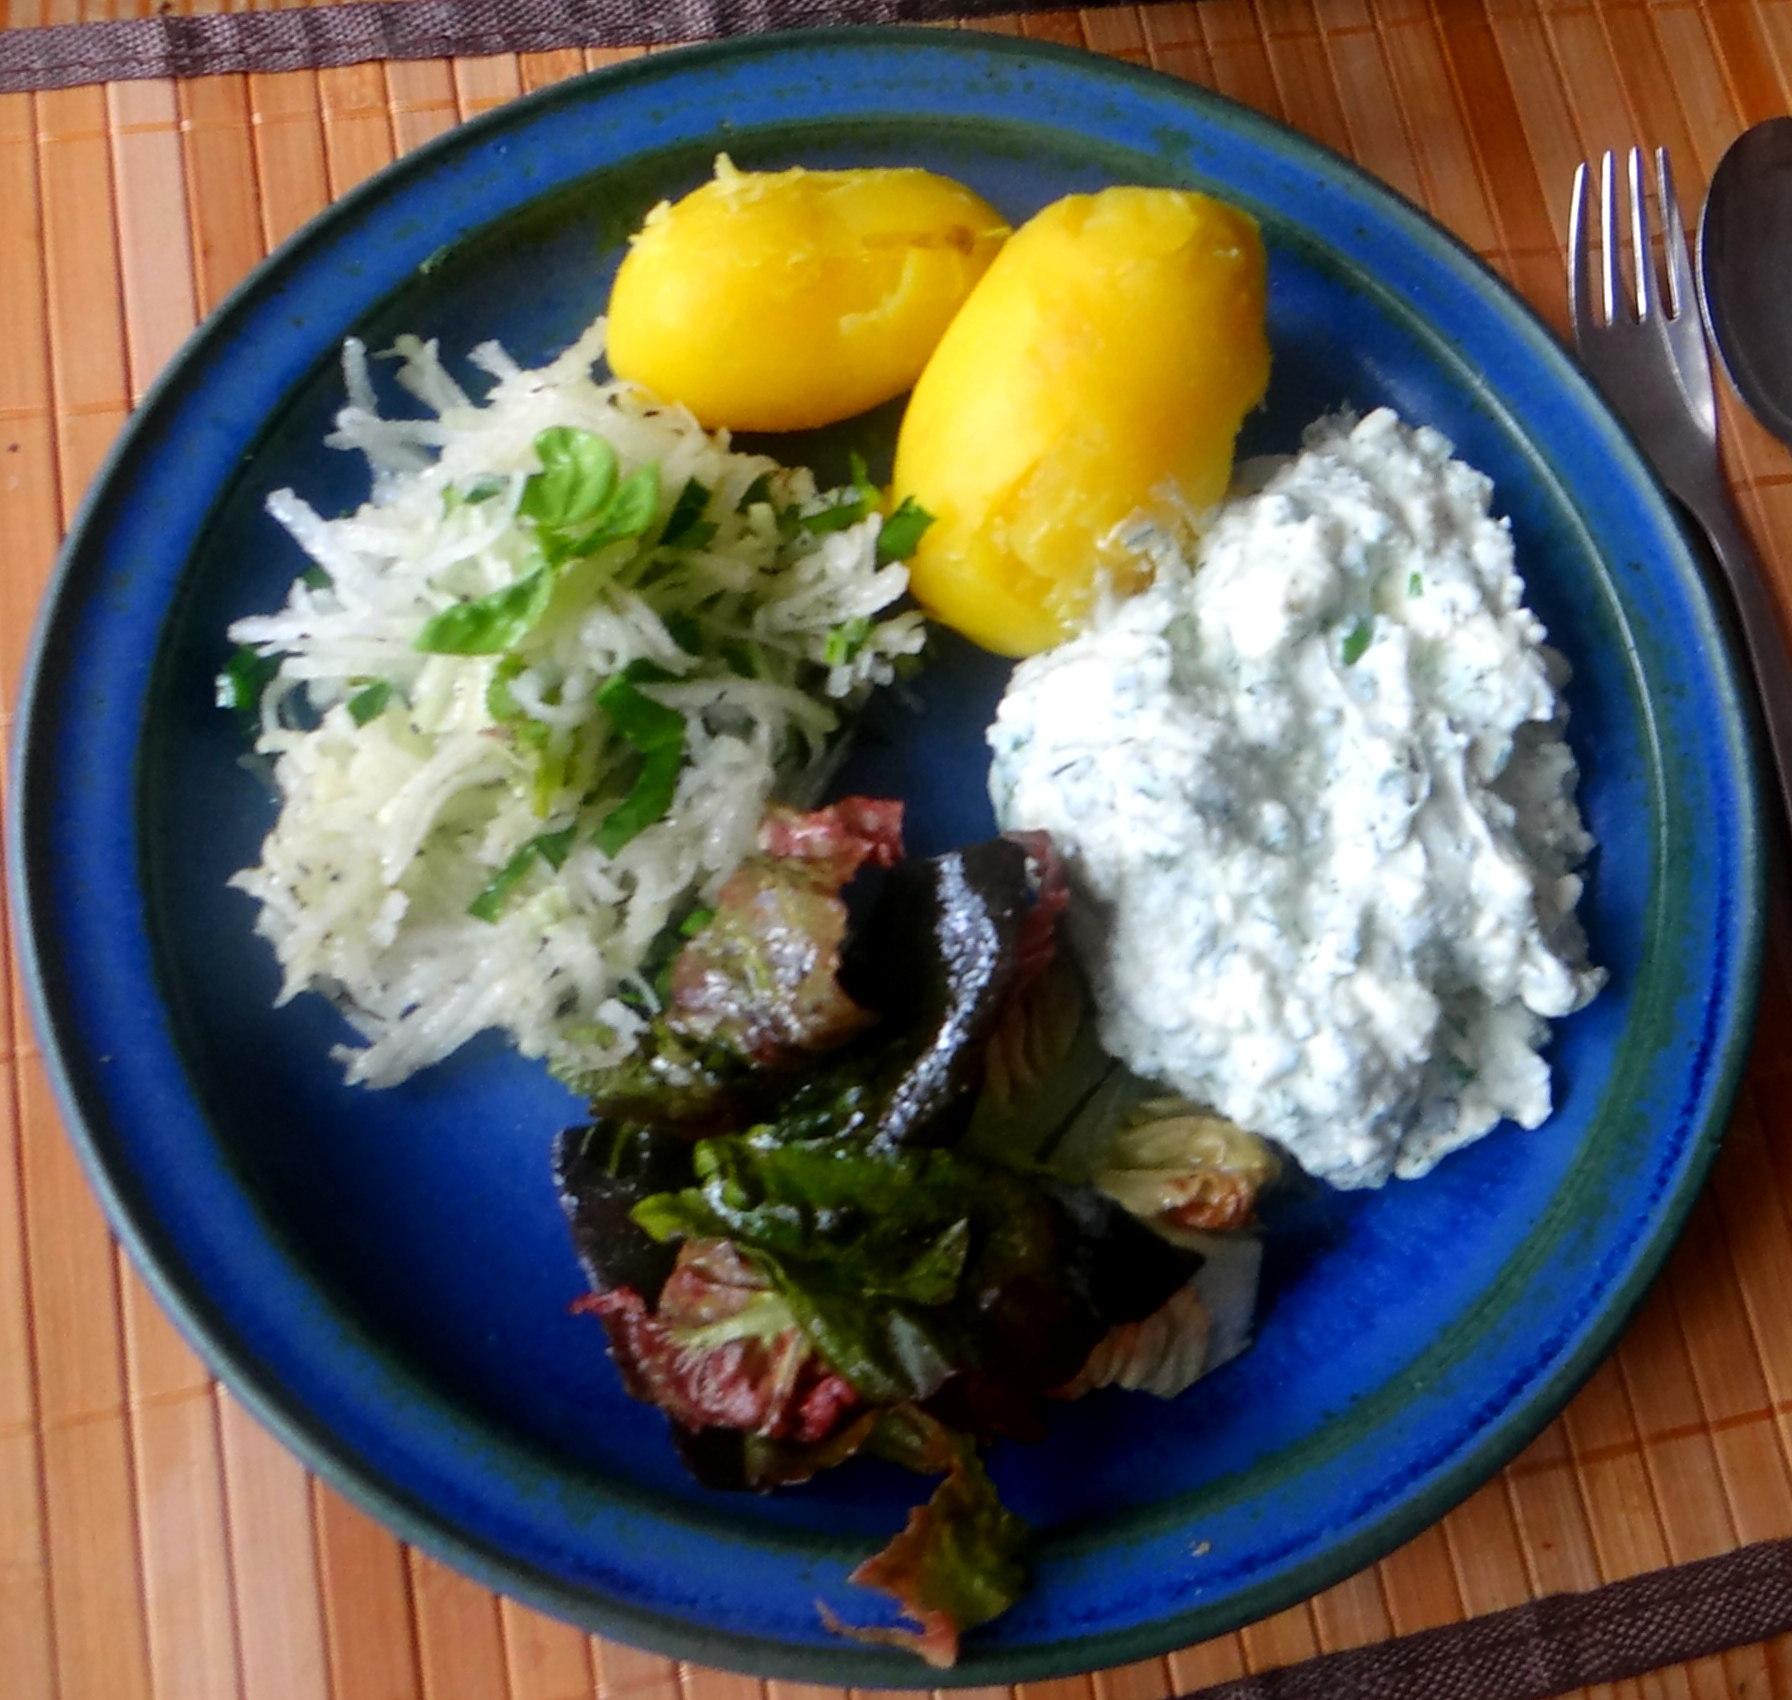 Quark,Pellkartoffeln,Kohlrabisalat,Roemersalat,Dessert (2)